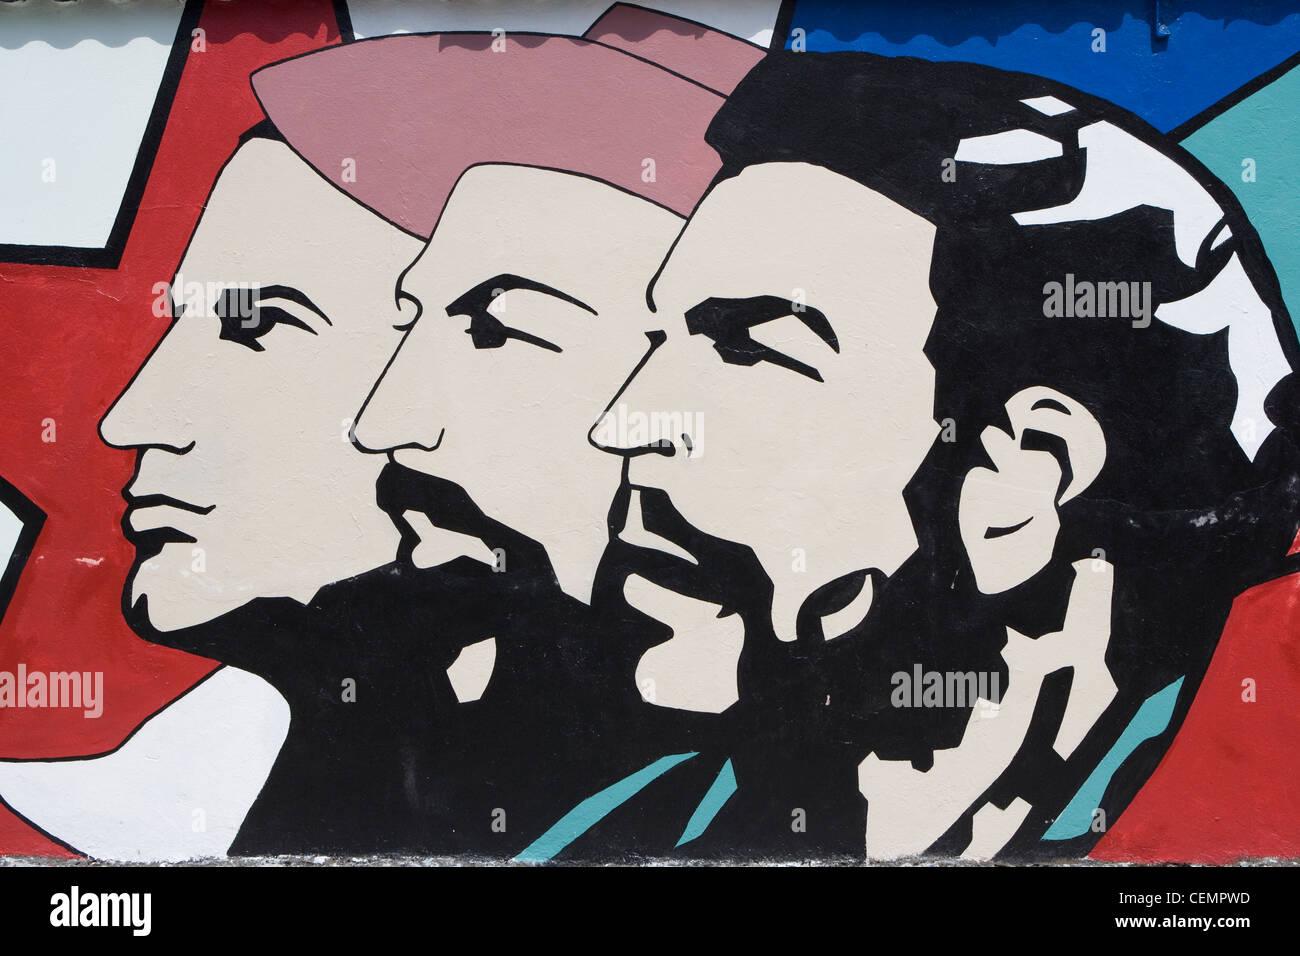 Cuba revolutionary propaganda wall art featuring Che Guevara Fidel Castro & Cuba: revolutionary propaganda wall art featuring Che Guevara Fidel ...